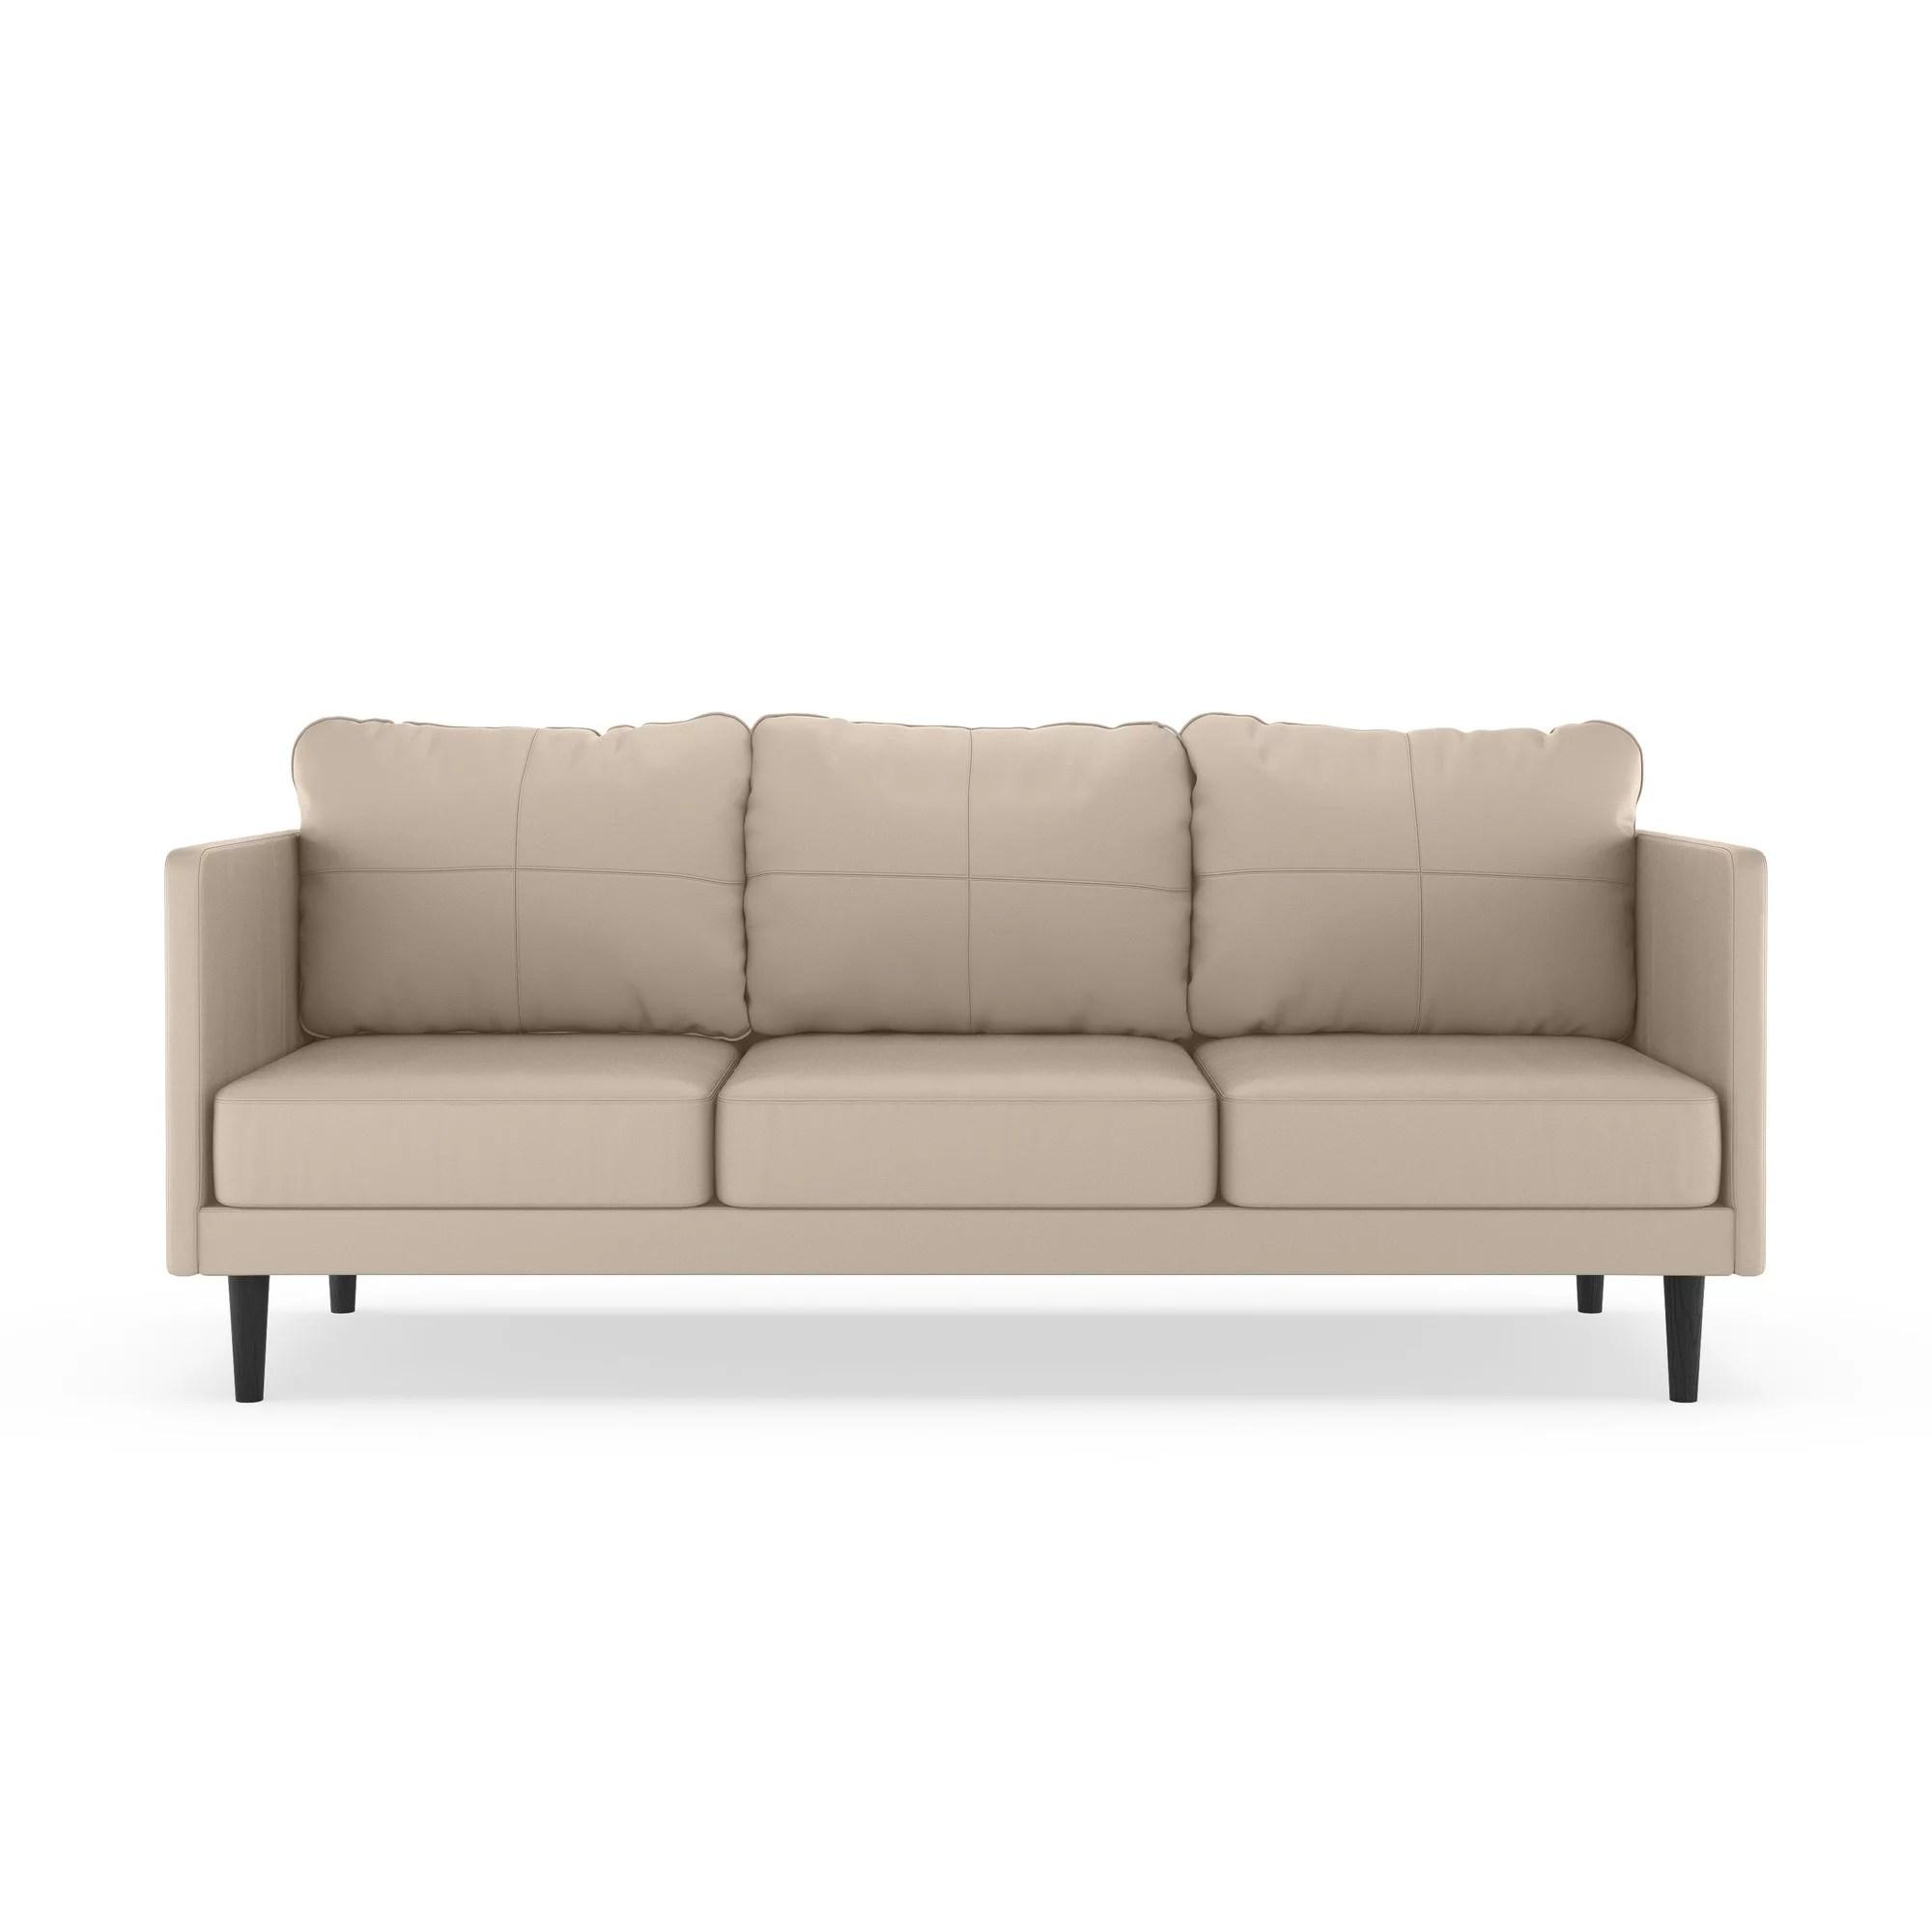 essex sofas sofa protectors for dogs uk vegan leather oat walmart